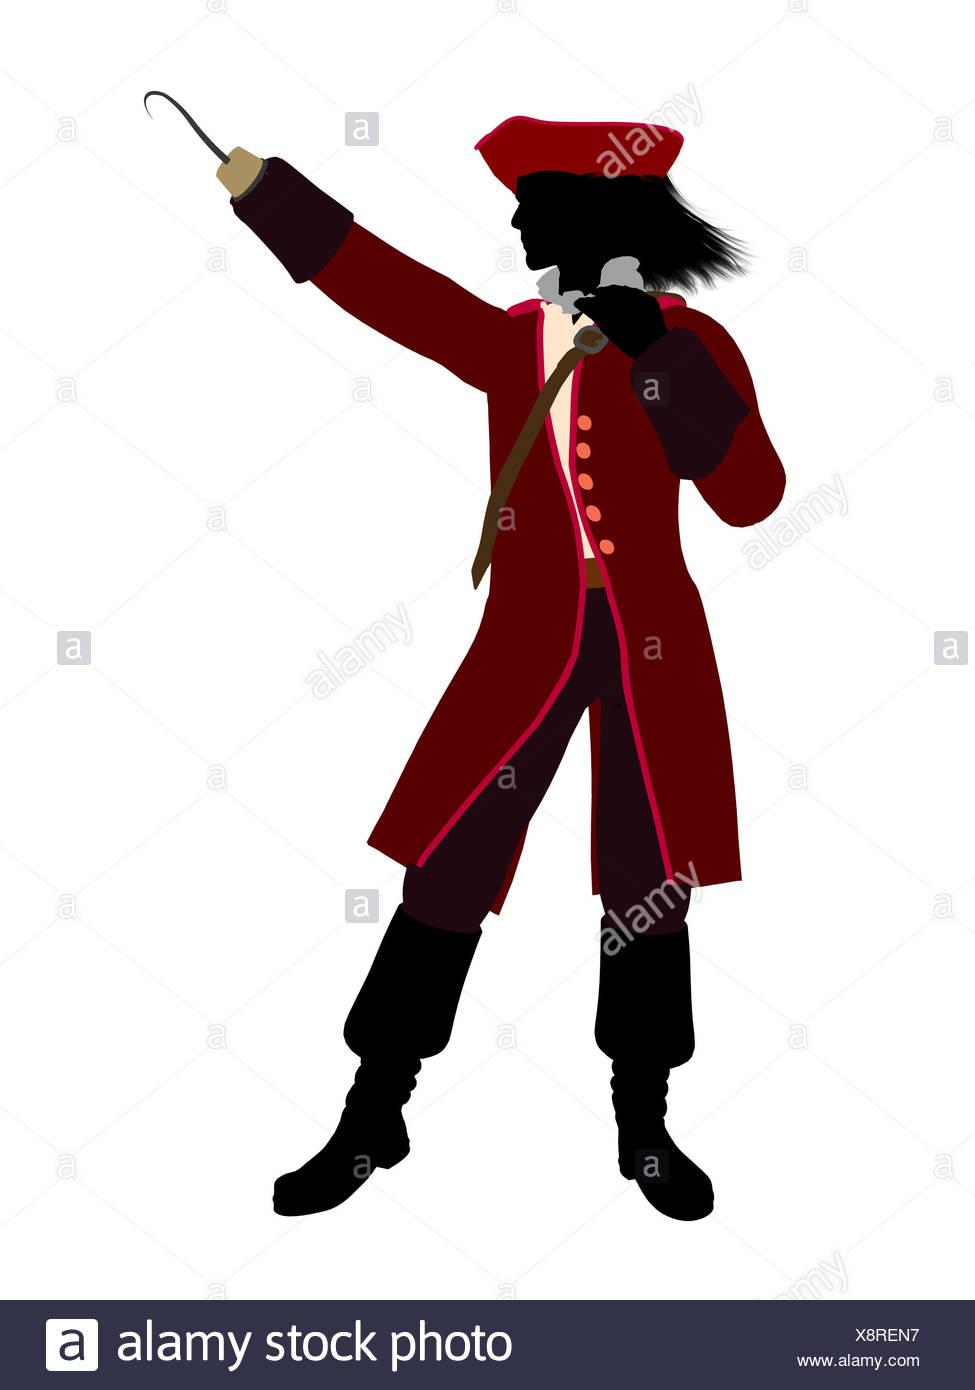 captain hook silhouette at getdrawings  free download